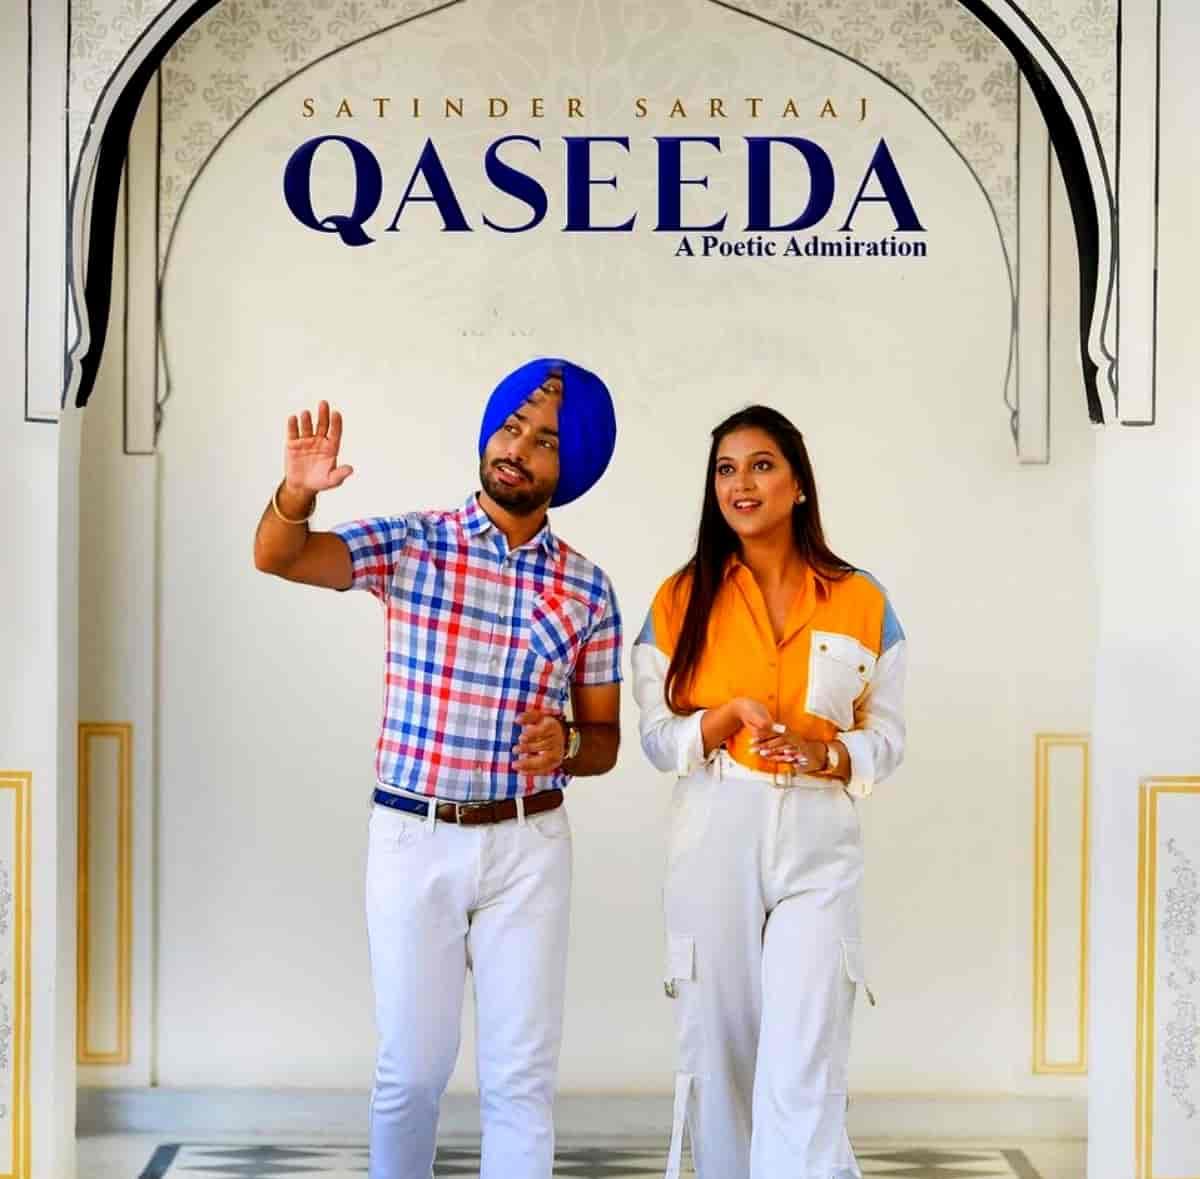 Qaseeda Punjabi Song Image Features Satinder Sartaaj and Sawan Rupowali